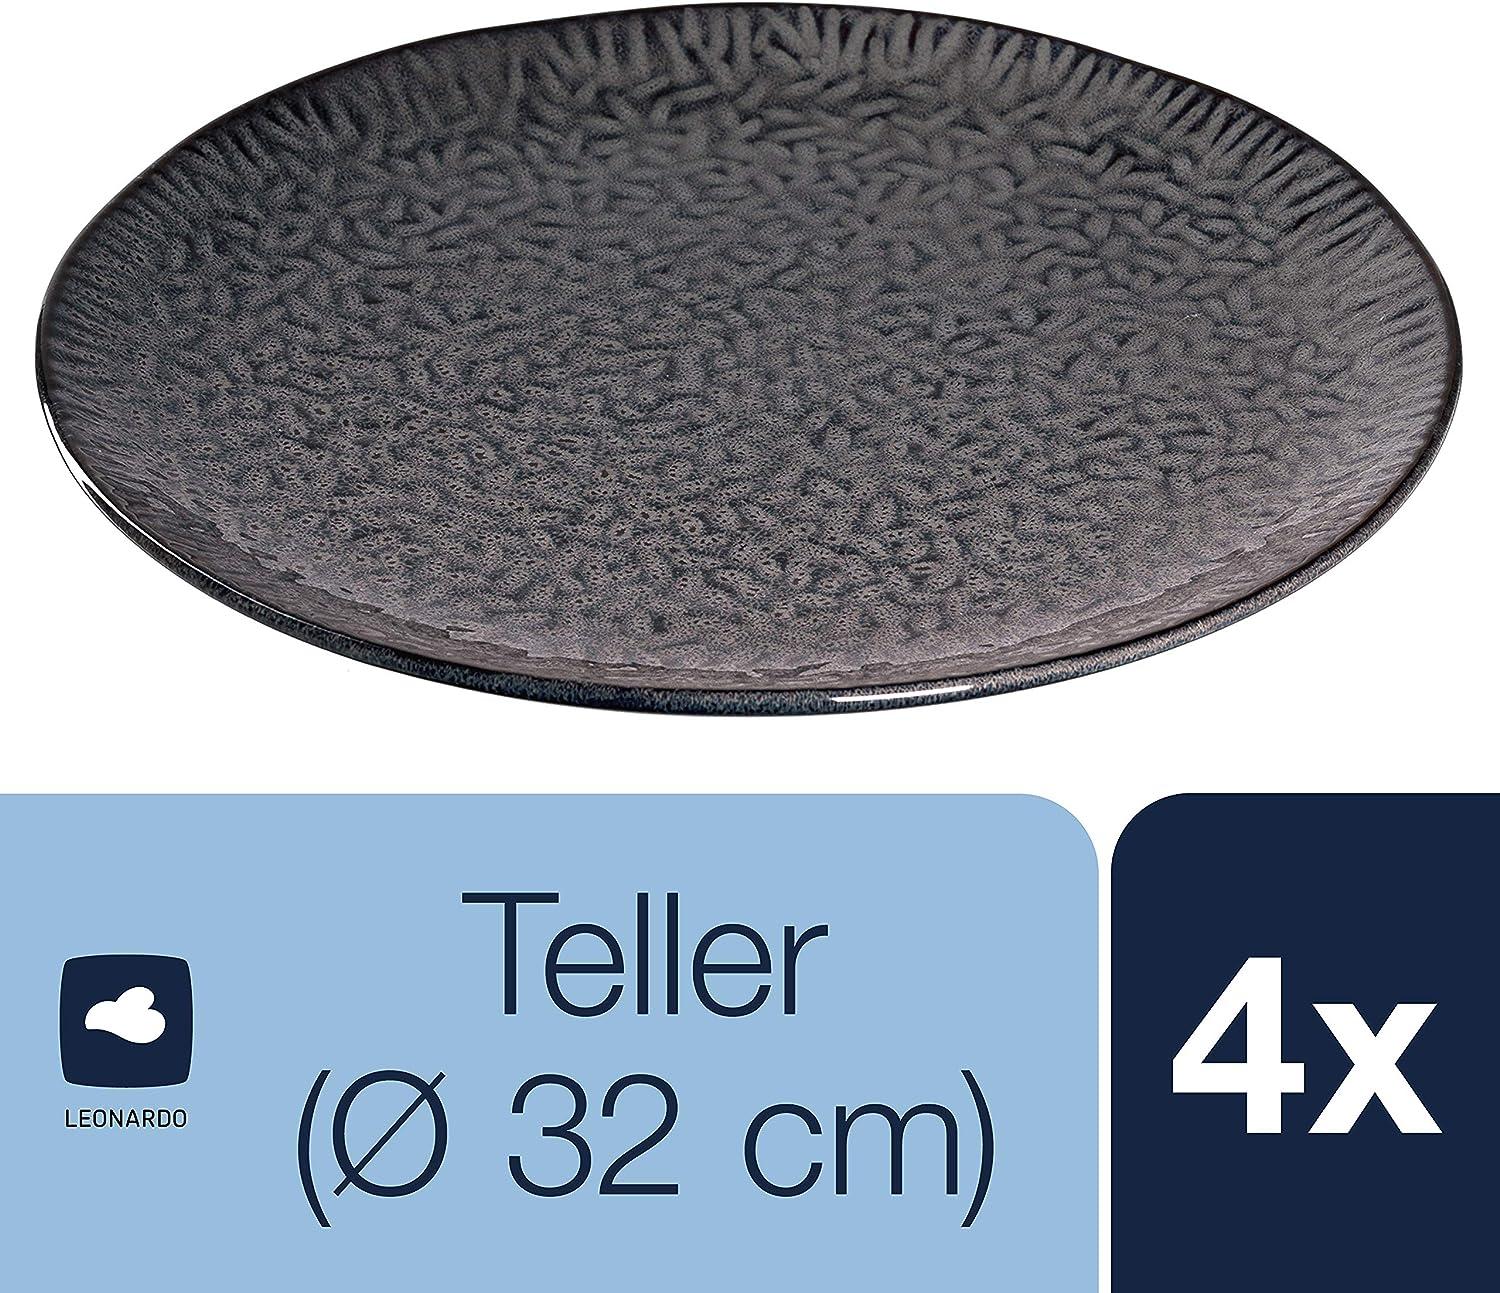 018605 Pizza-Teller mit Glasur Leonardo Matera Keramik-Teller 4-er Set sp/ülmaschinengeeignete Platzteller 4 runde Steingut-Teller /Ø 32 cm grau